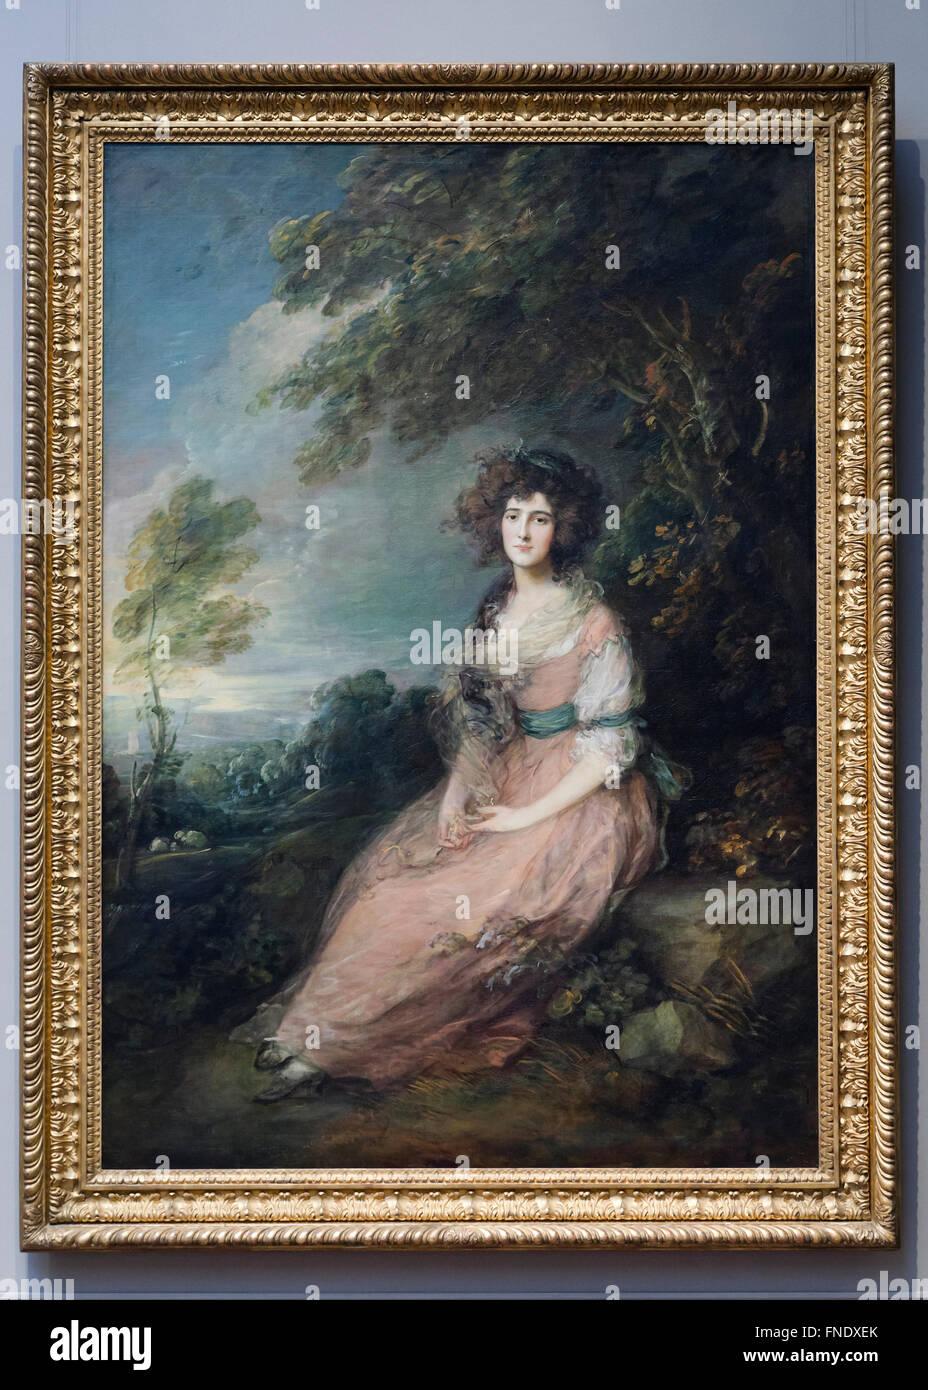 Frau Richard Brinsley Sherican von Thomas Gainsborough, ca. 1785 Stockbild